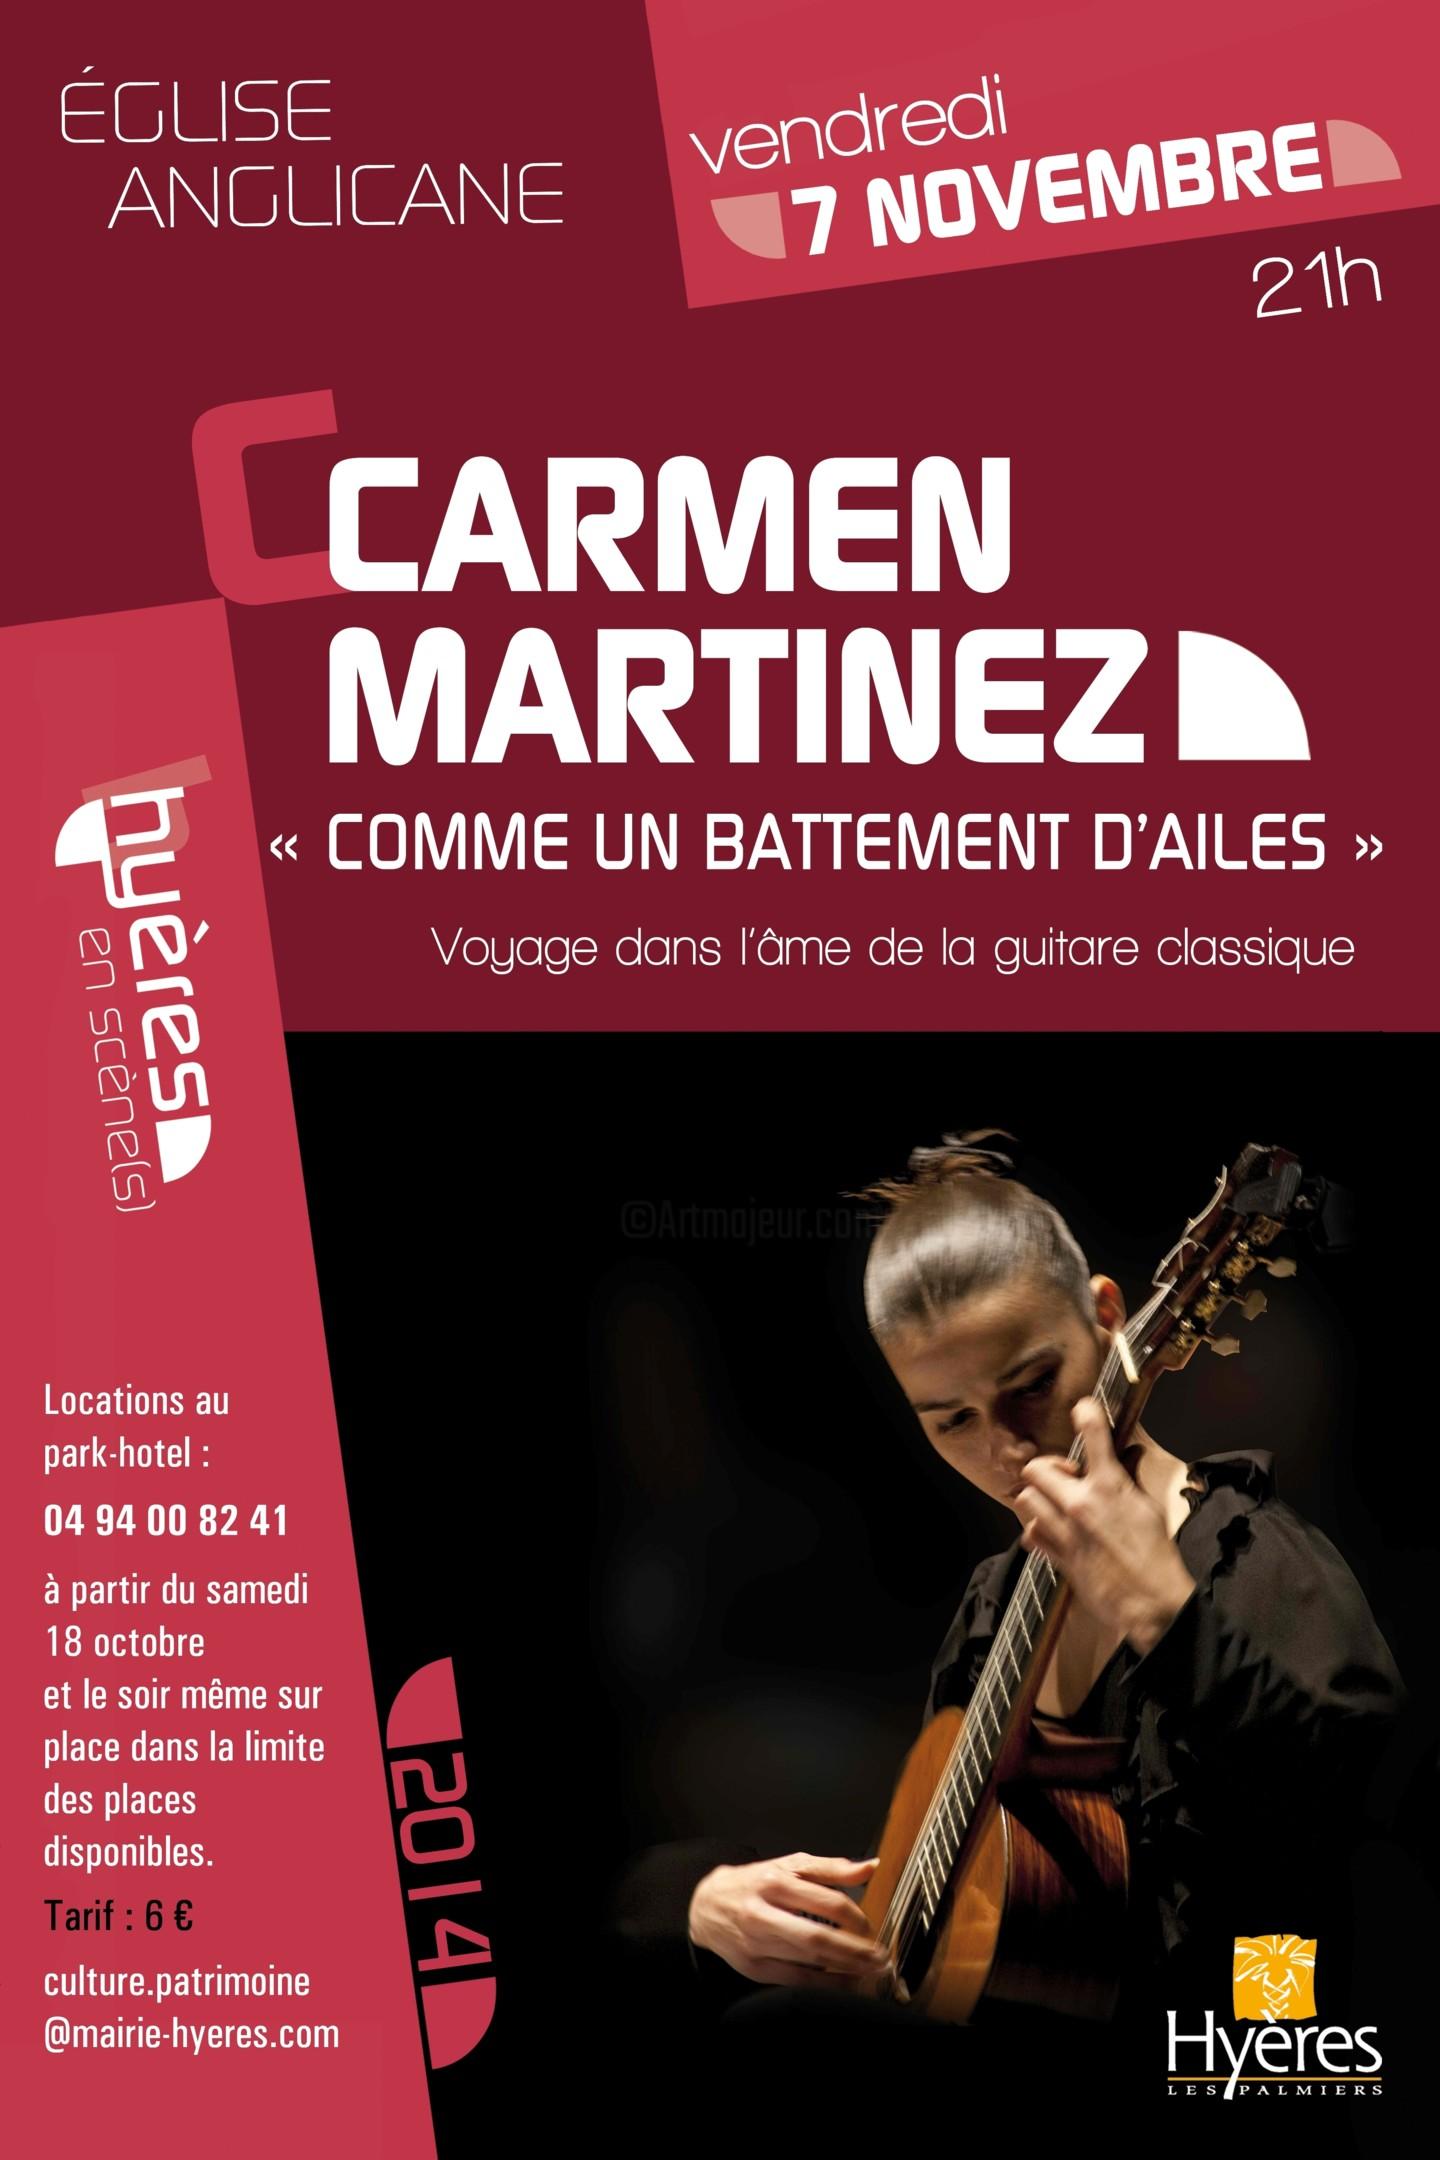 carmen martinez - Prochain Concert